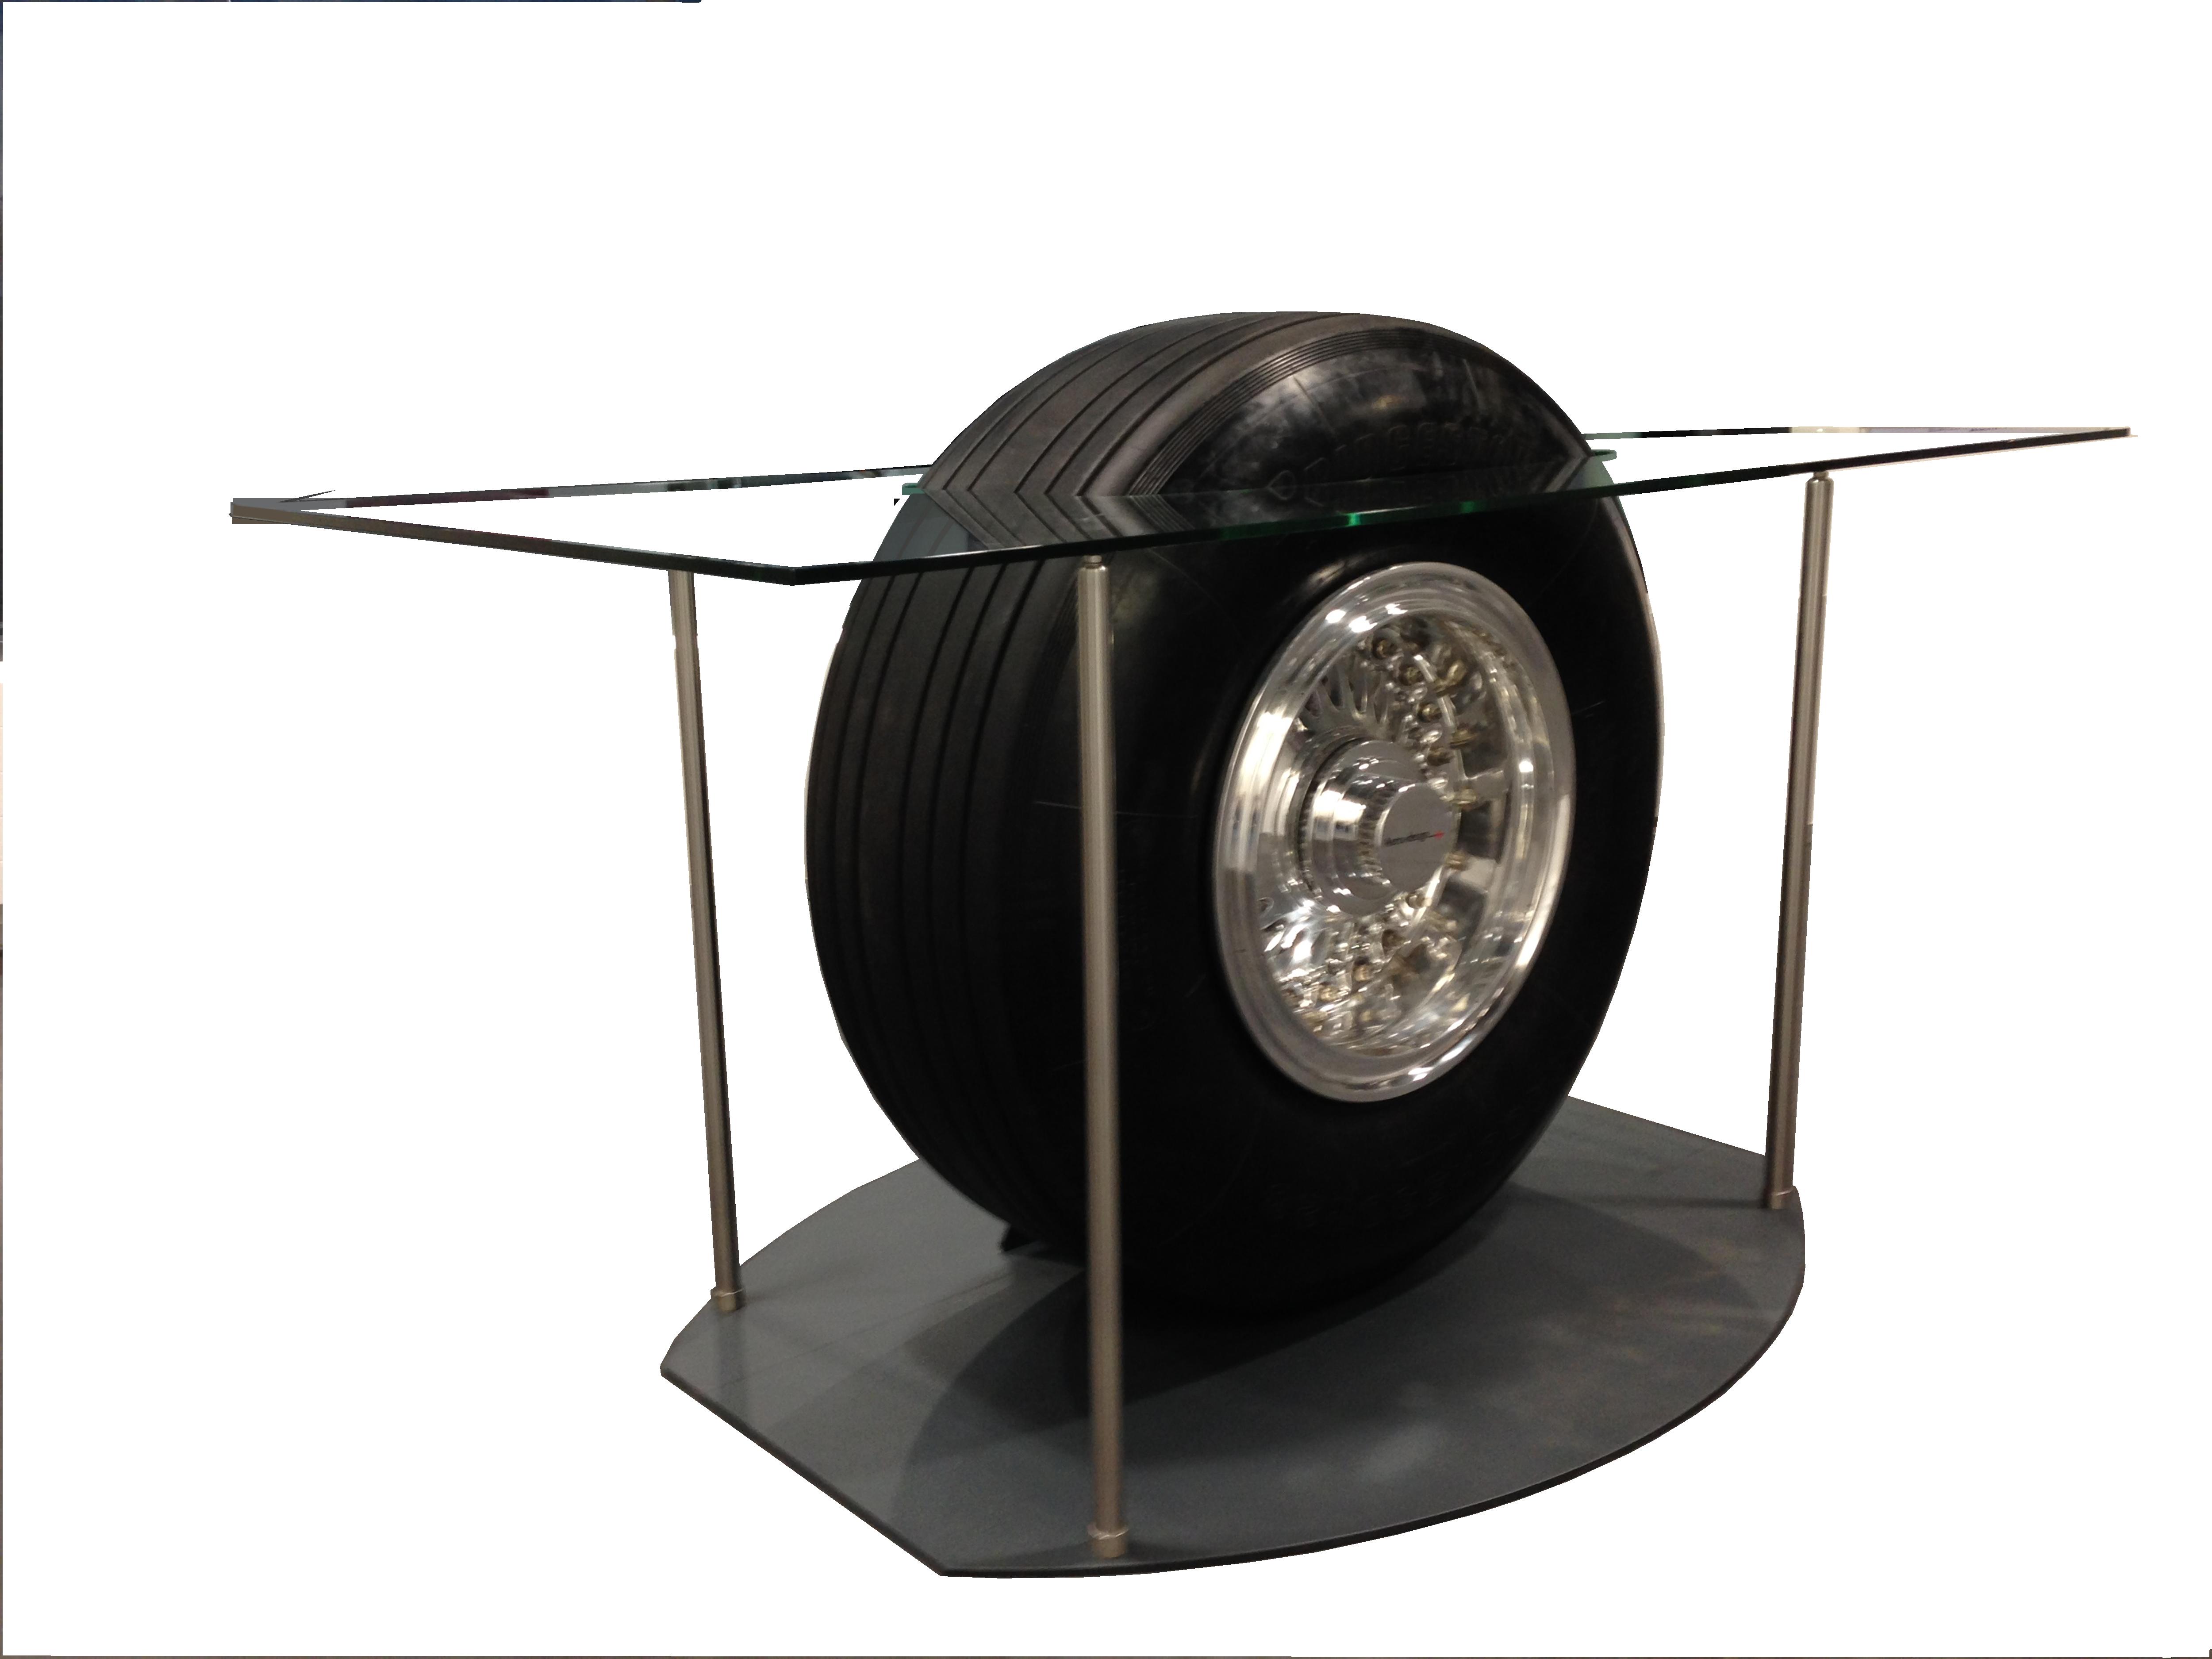 Mobilier Aeronautique Design Aeronautique Aero Design Art  # Meuble Carlingue